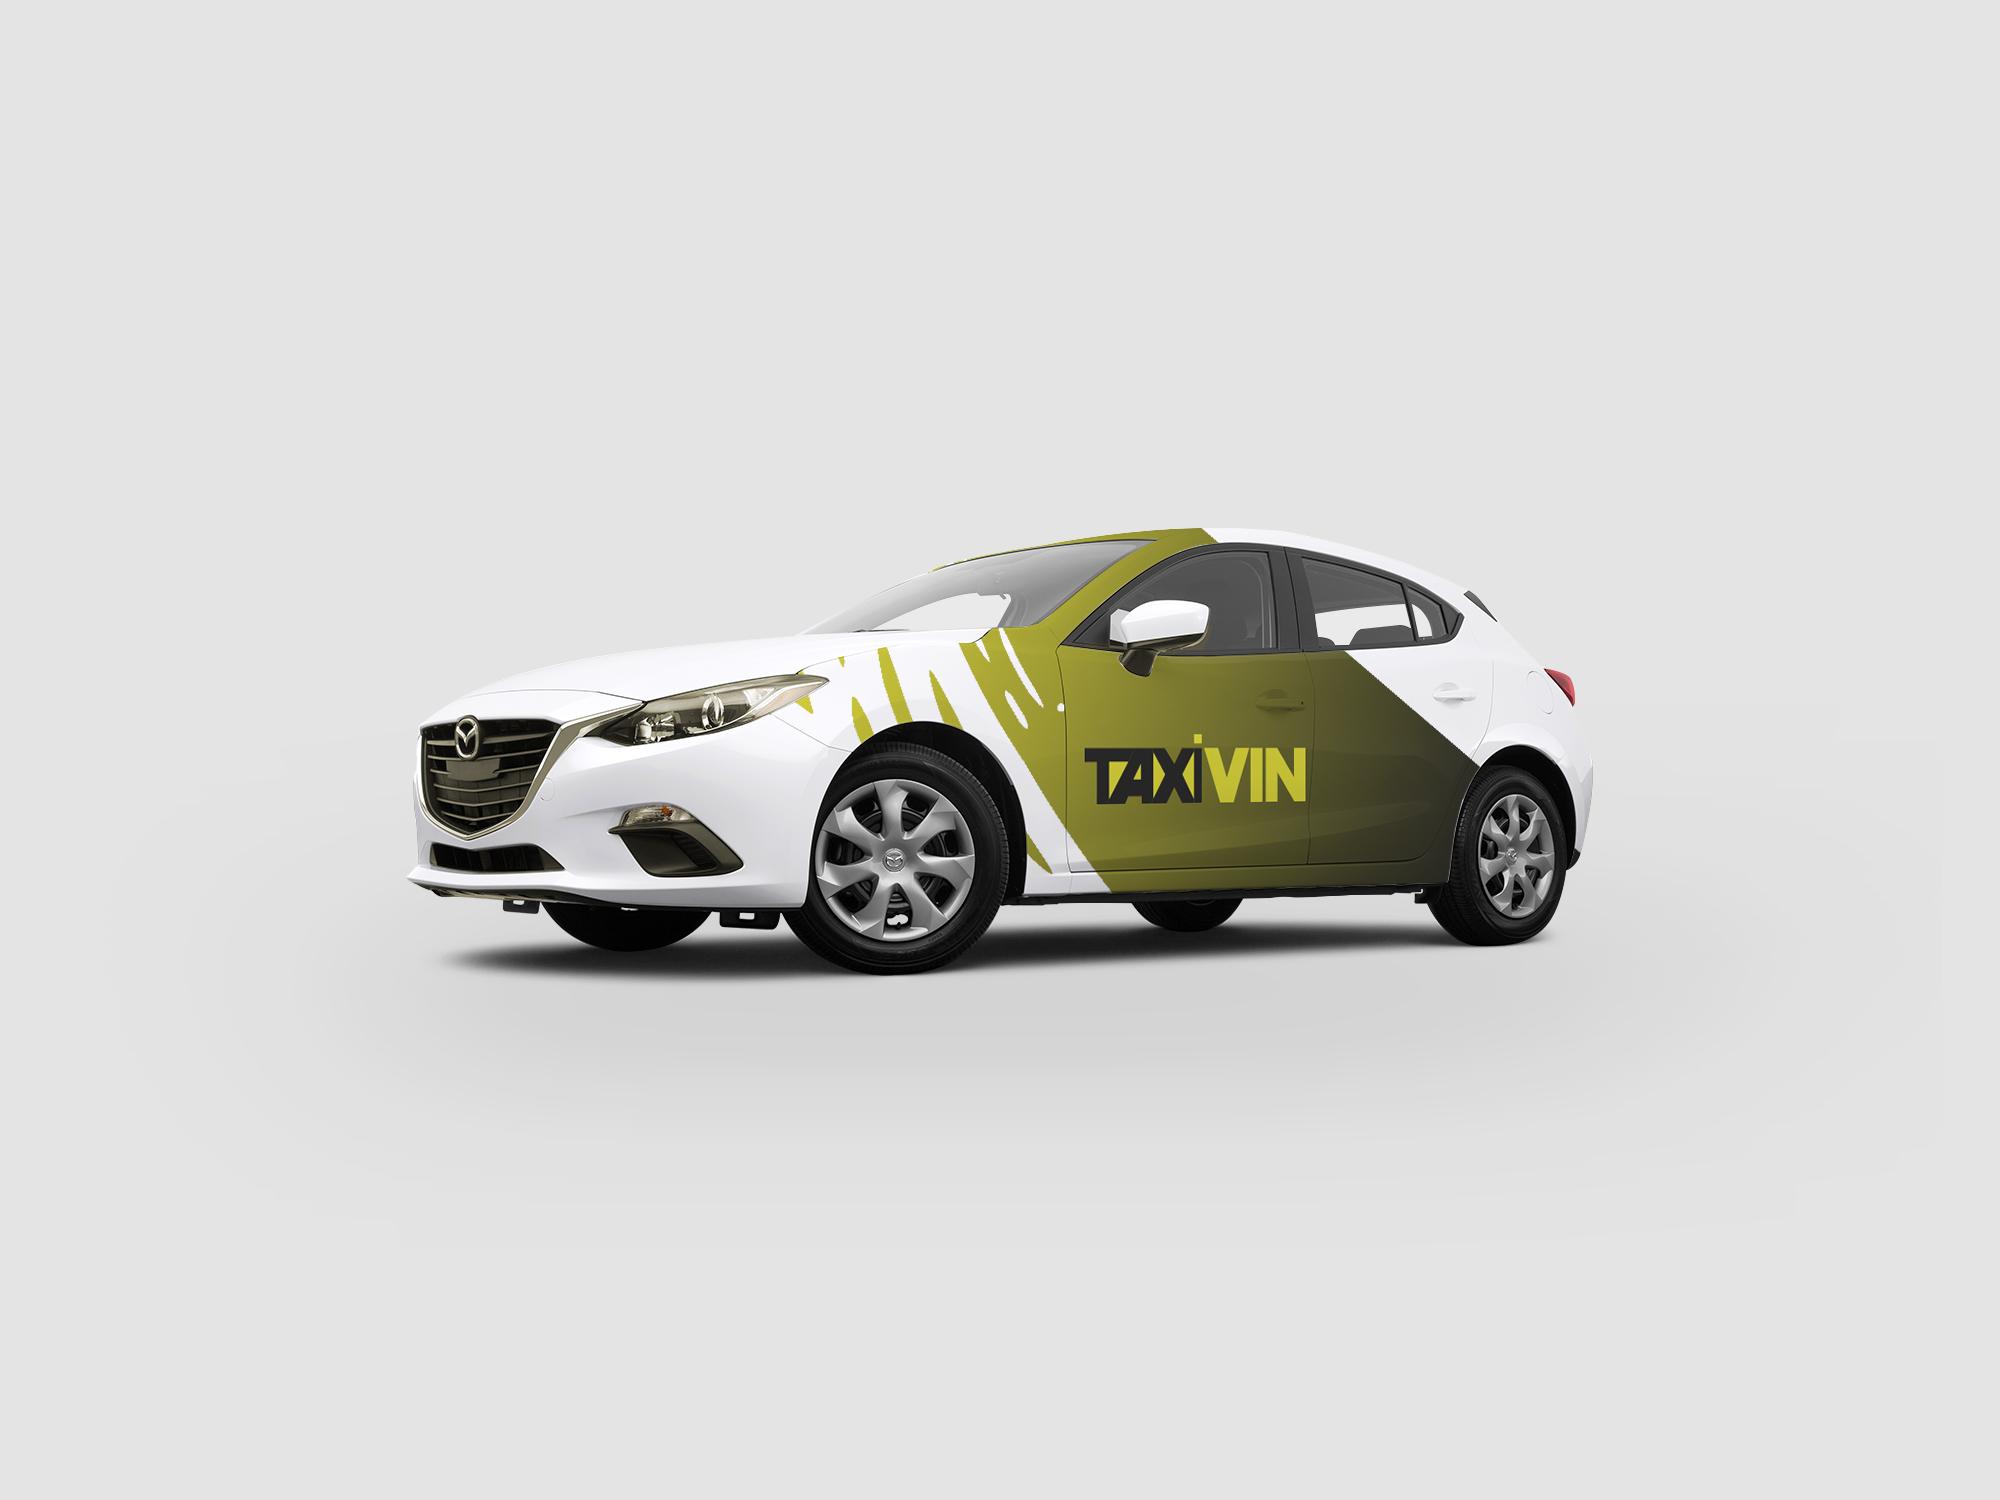 Разработка логотипа и фирменного стиля для такси фото f_2635b9ce8cb82715.jpg